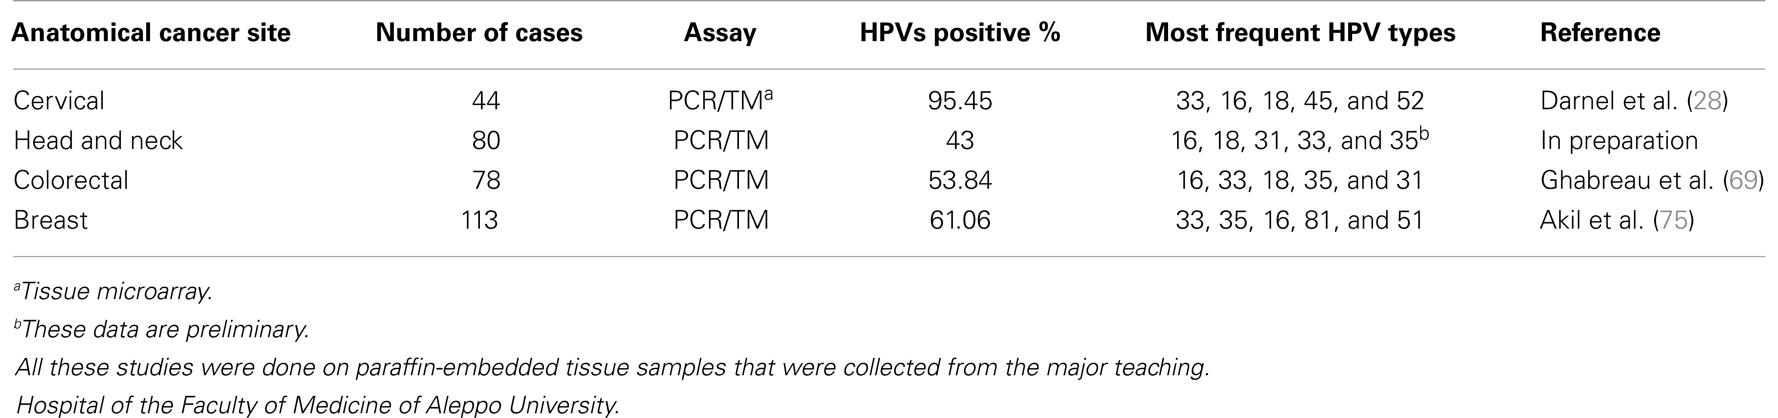 hpv vaccine m?nd pris